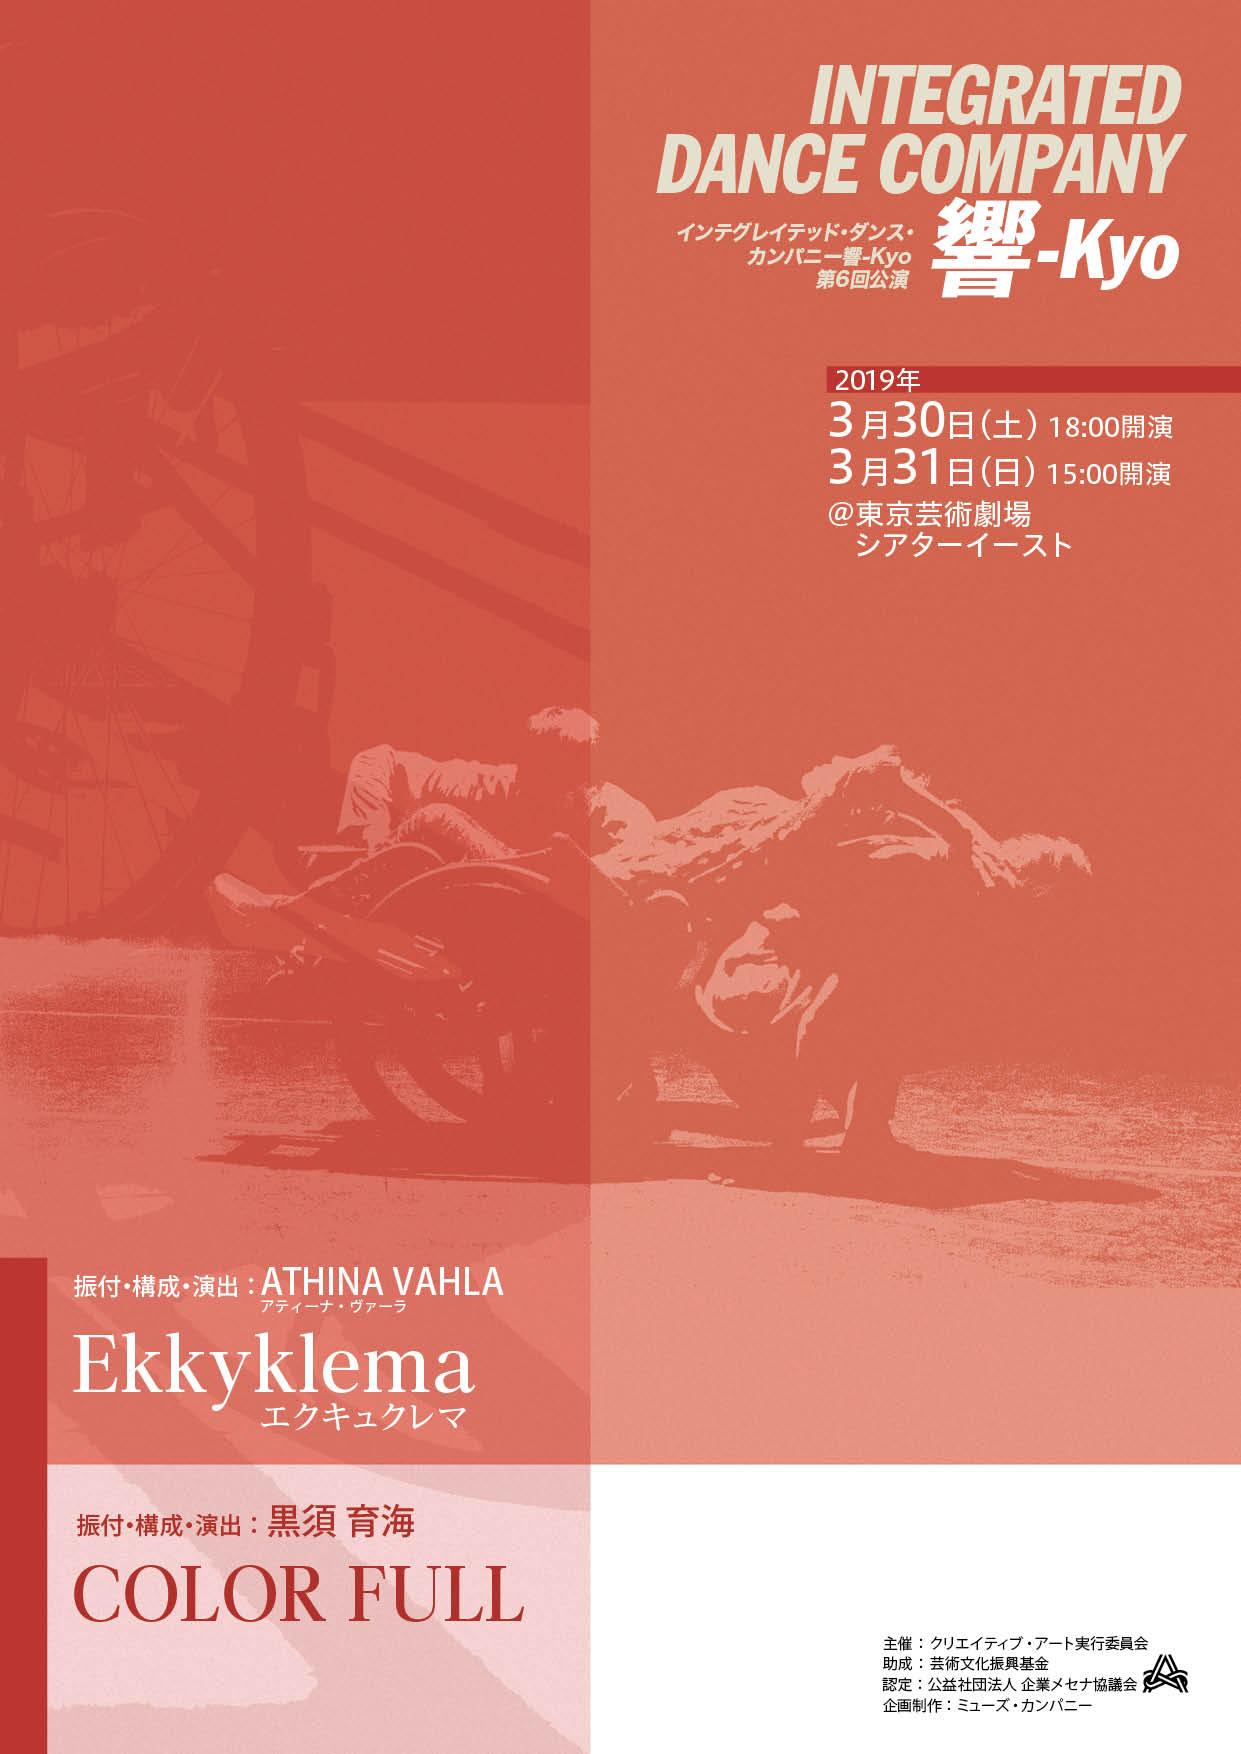 Integrated Dance Company響-Kyo第6回公演